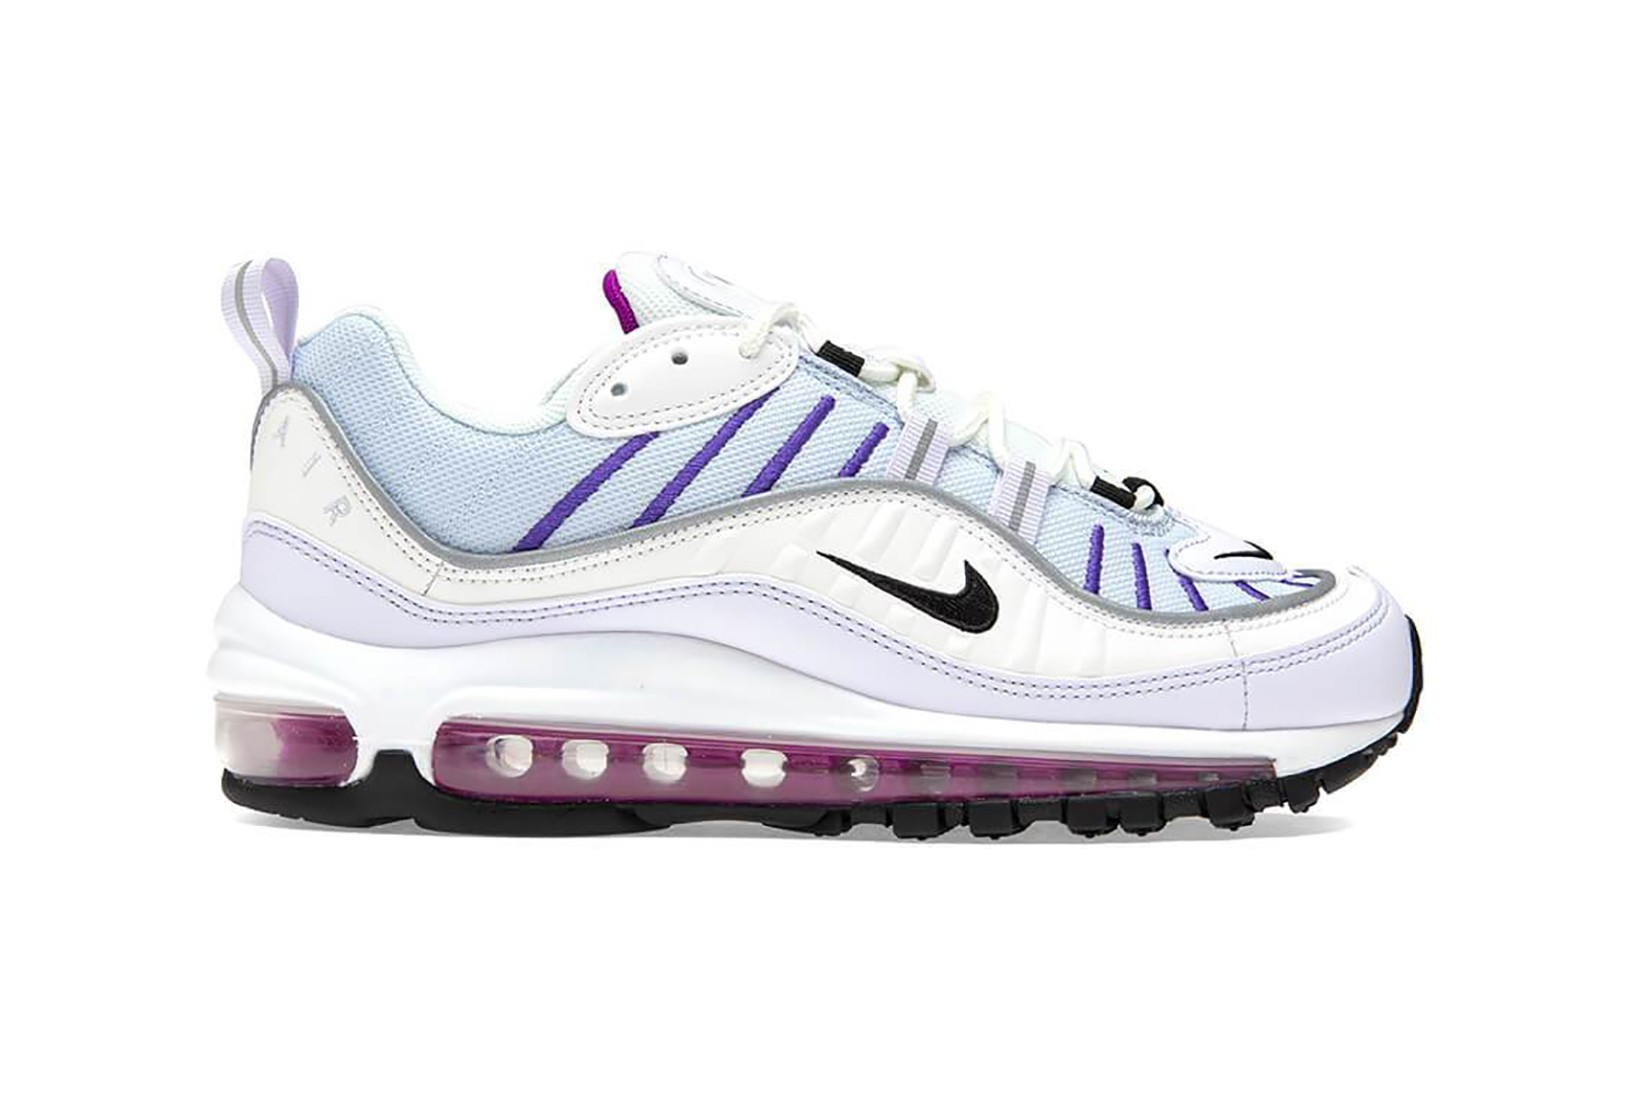 nike air max grey and purple